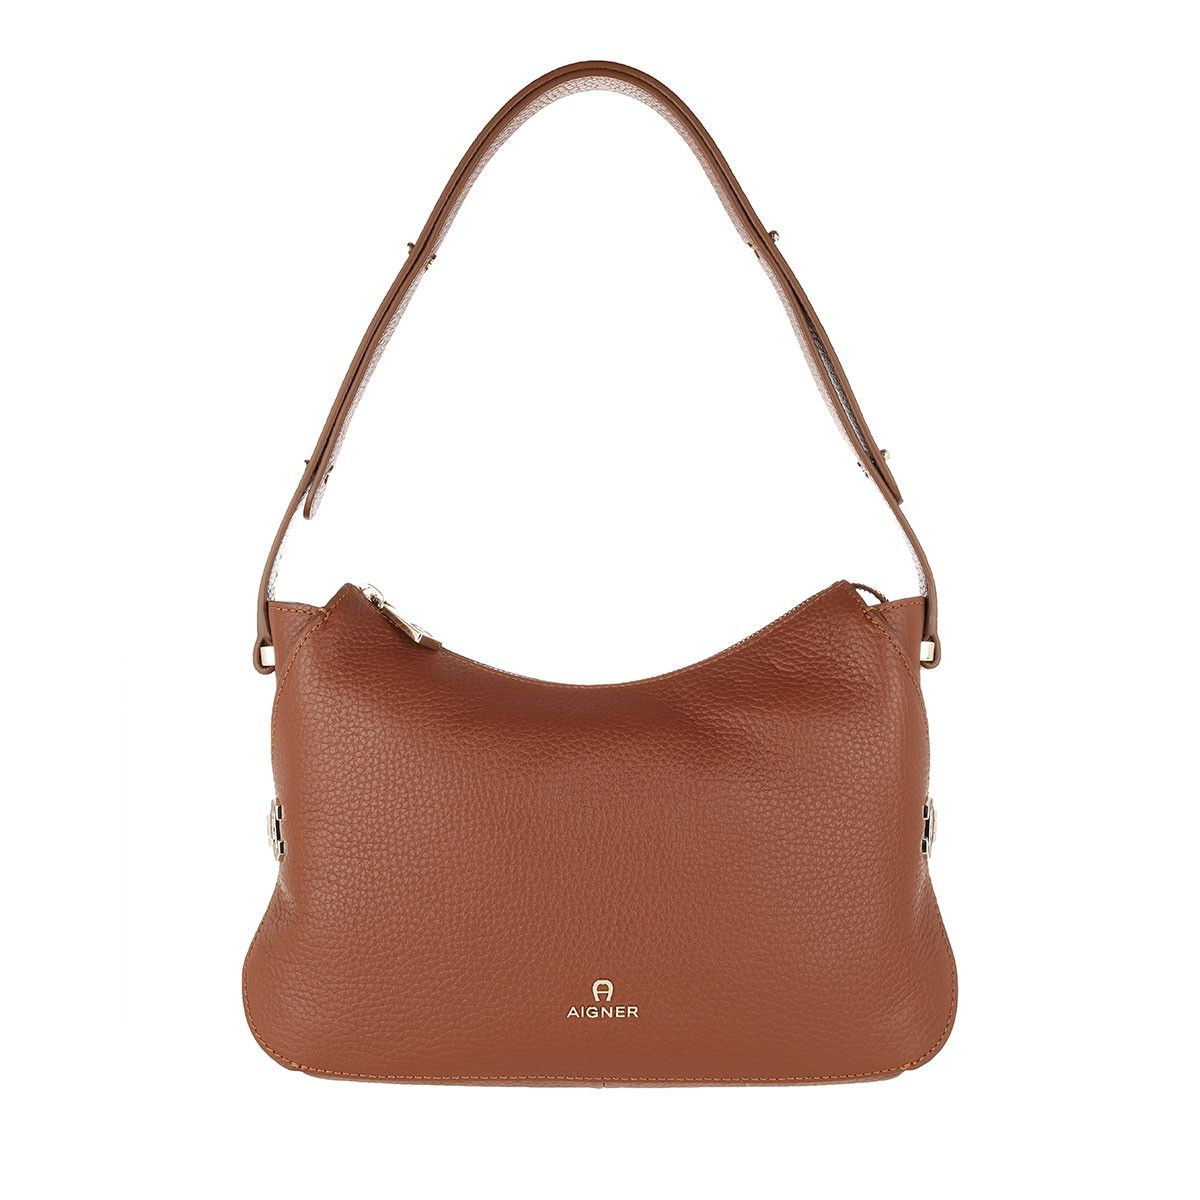 Aigner Hobo Bag - Milano Mini Shoulder Bag Cognac - in braun - für Damen